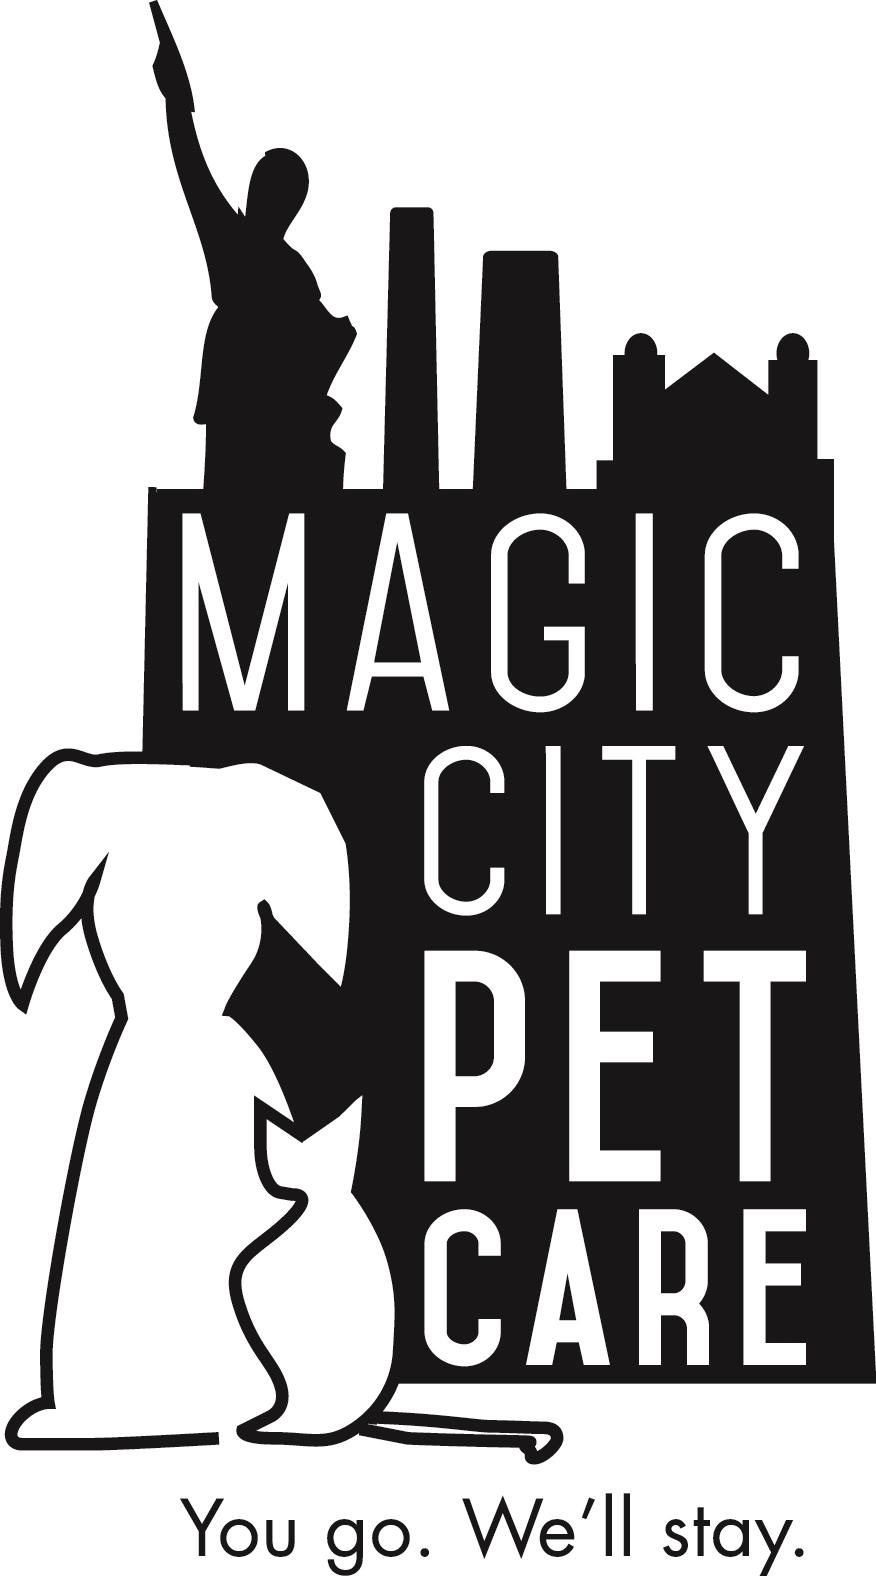 Dog Walker Application for Employment — Pet Sitting.